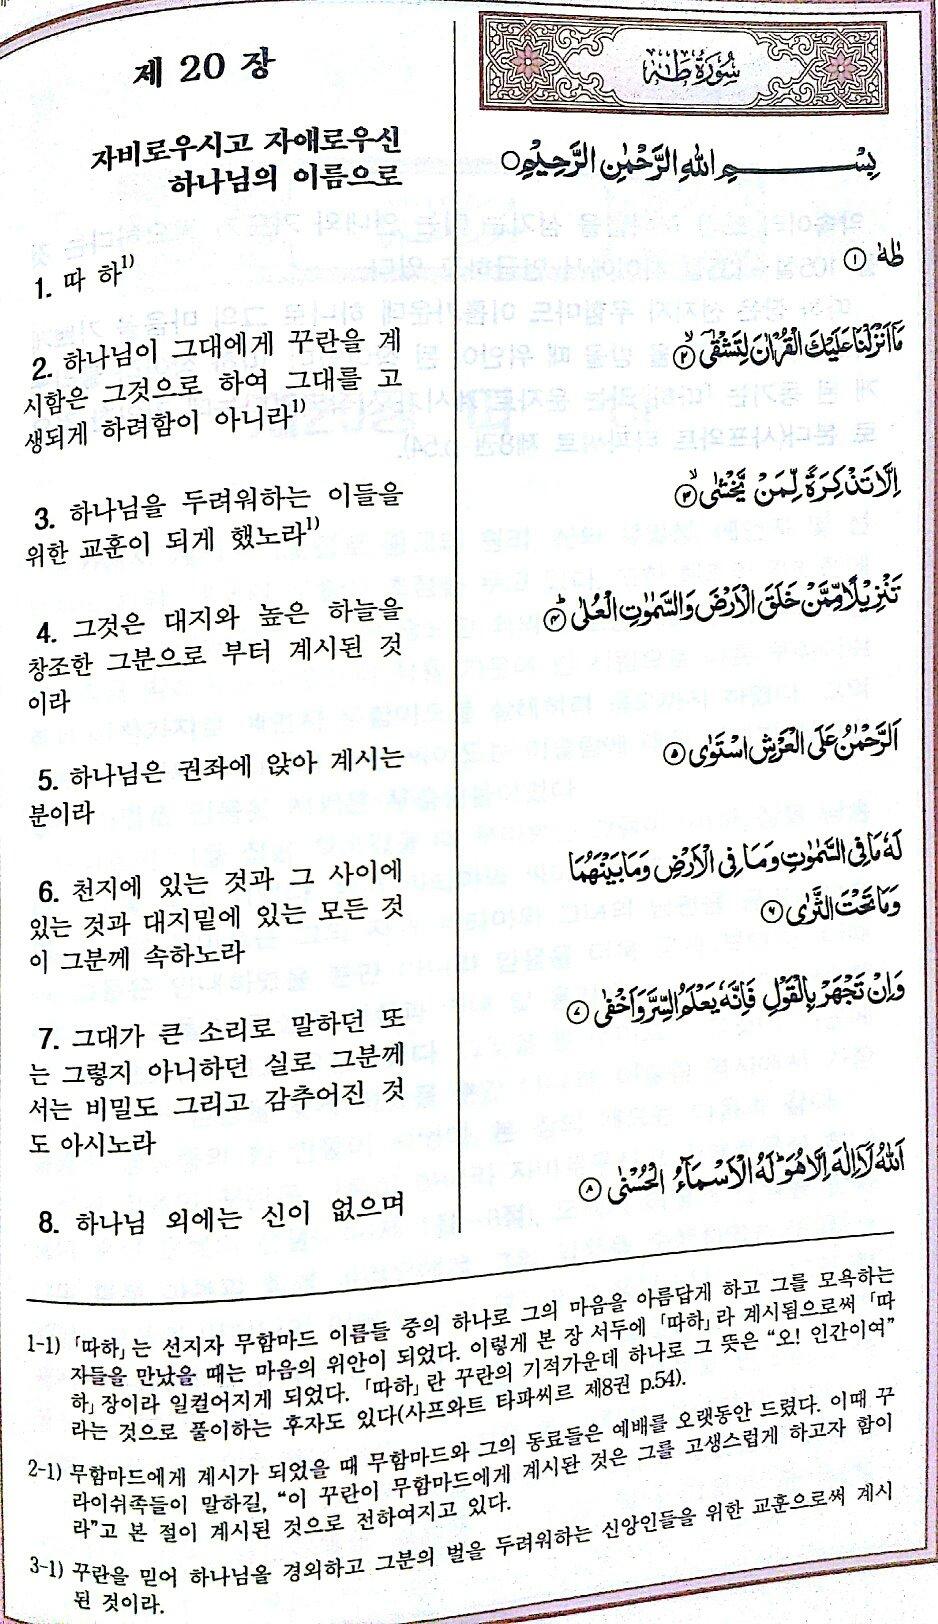 quran_korea_toha_about_Allah